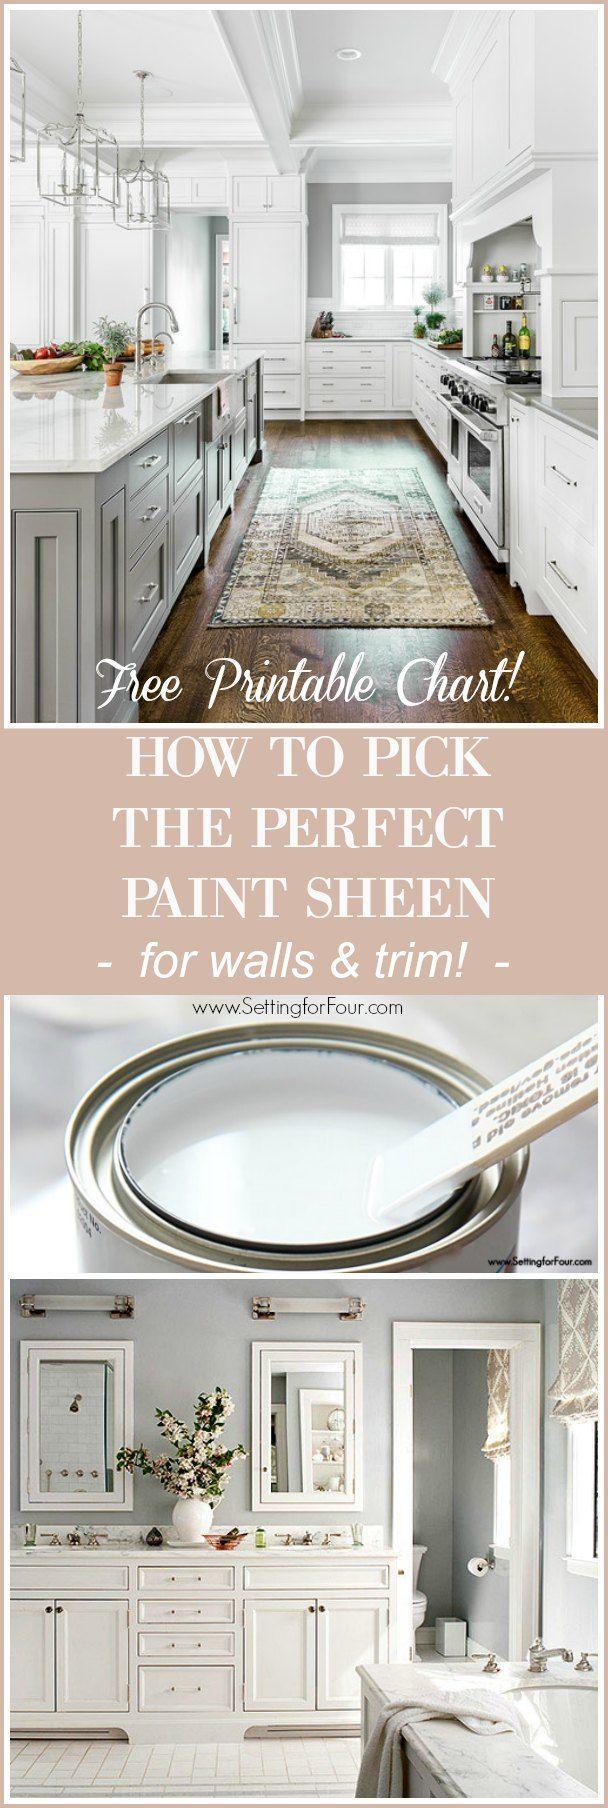 best 25 paint walls ideas on pinterest living room paint living room colors and living room. Black Bedroom Furniture Sets. Home Design Ideas